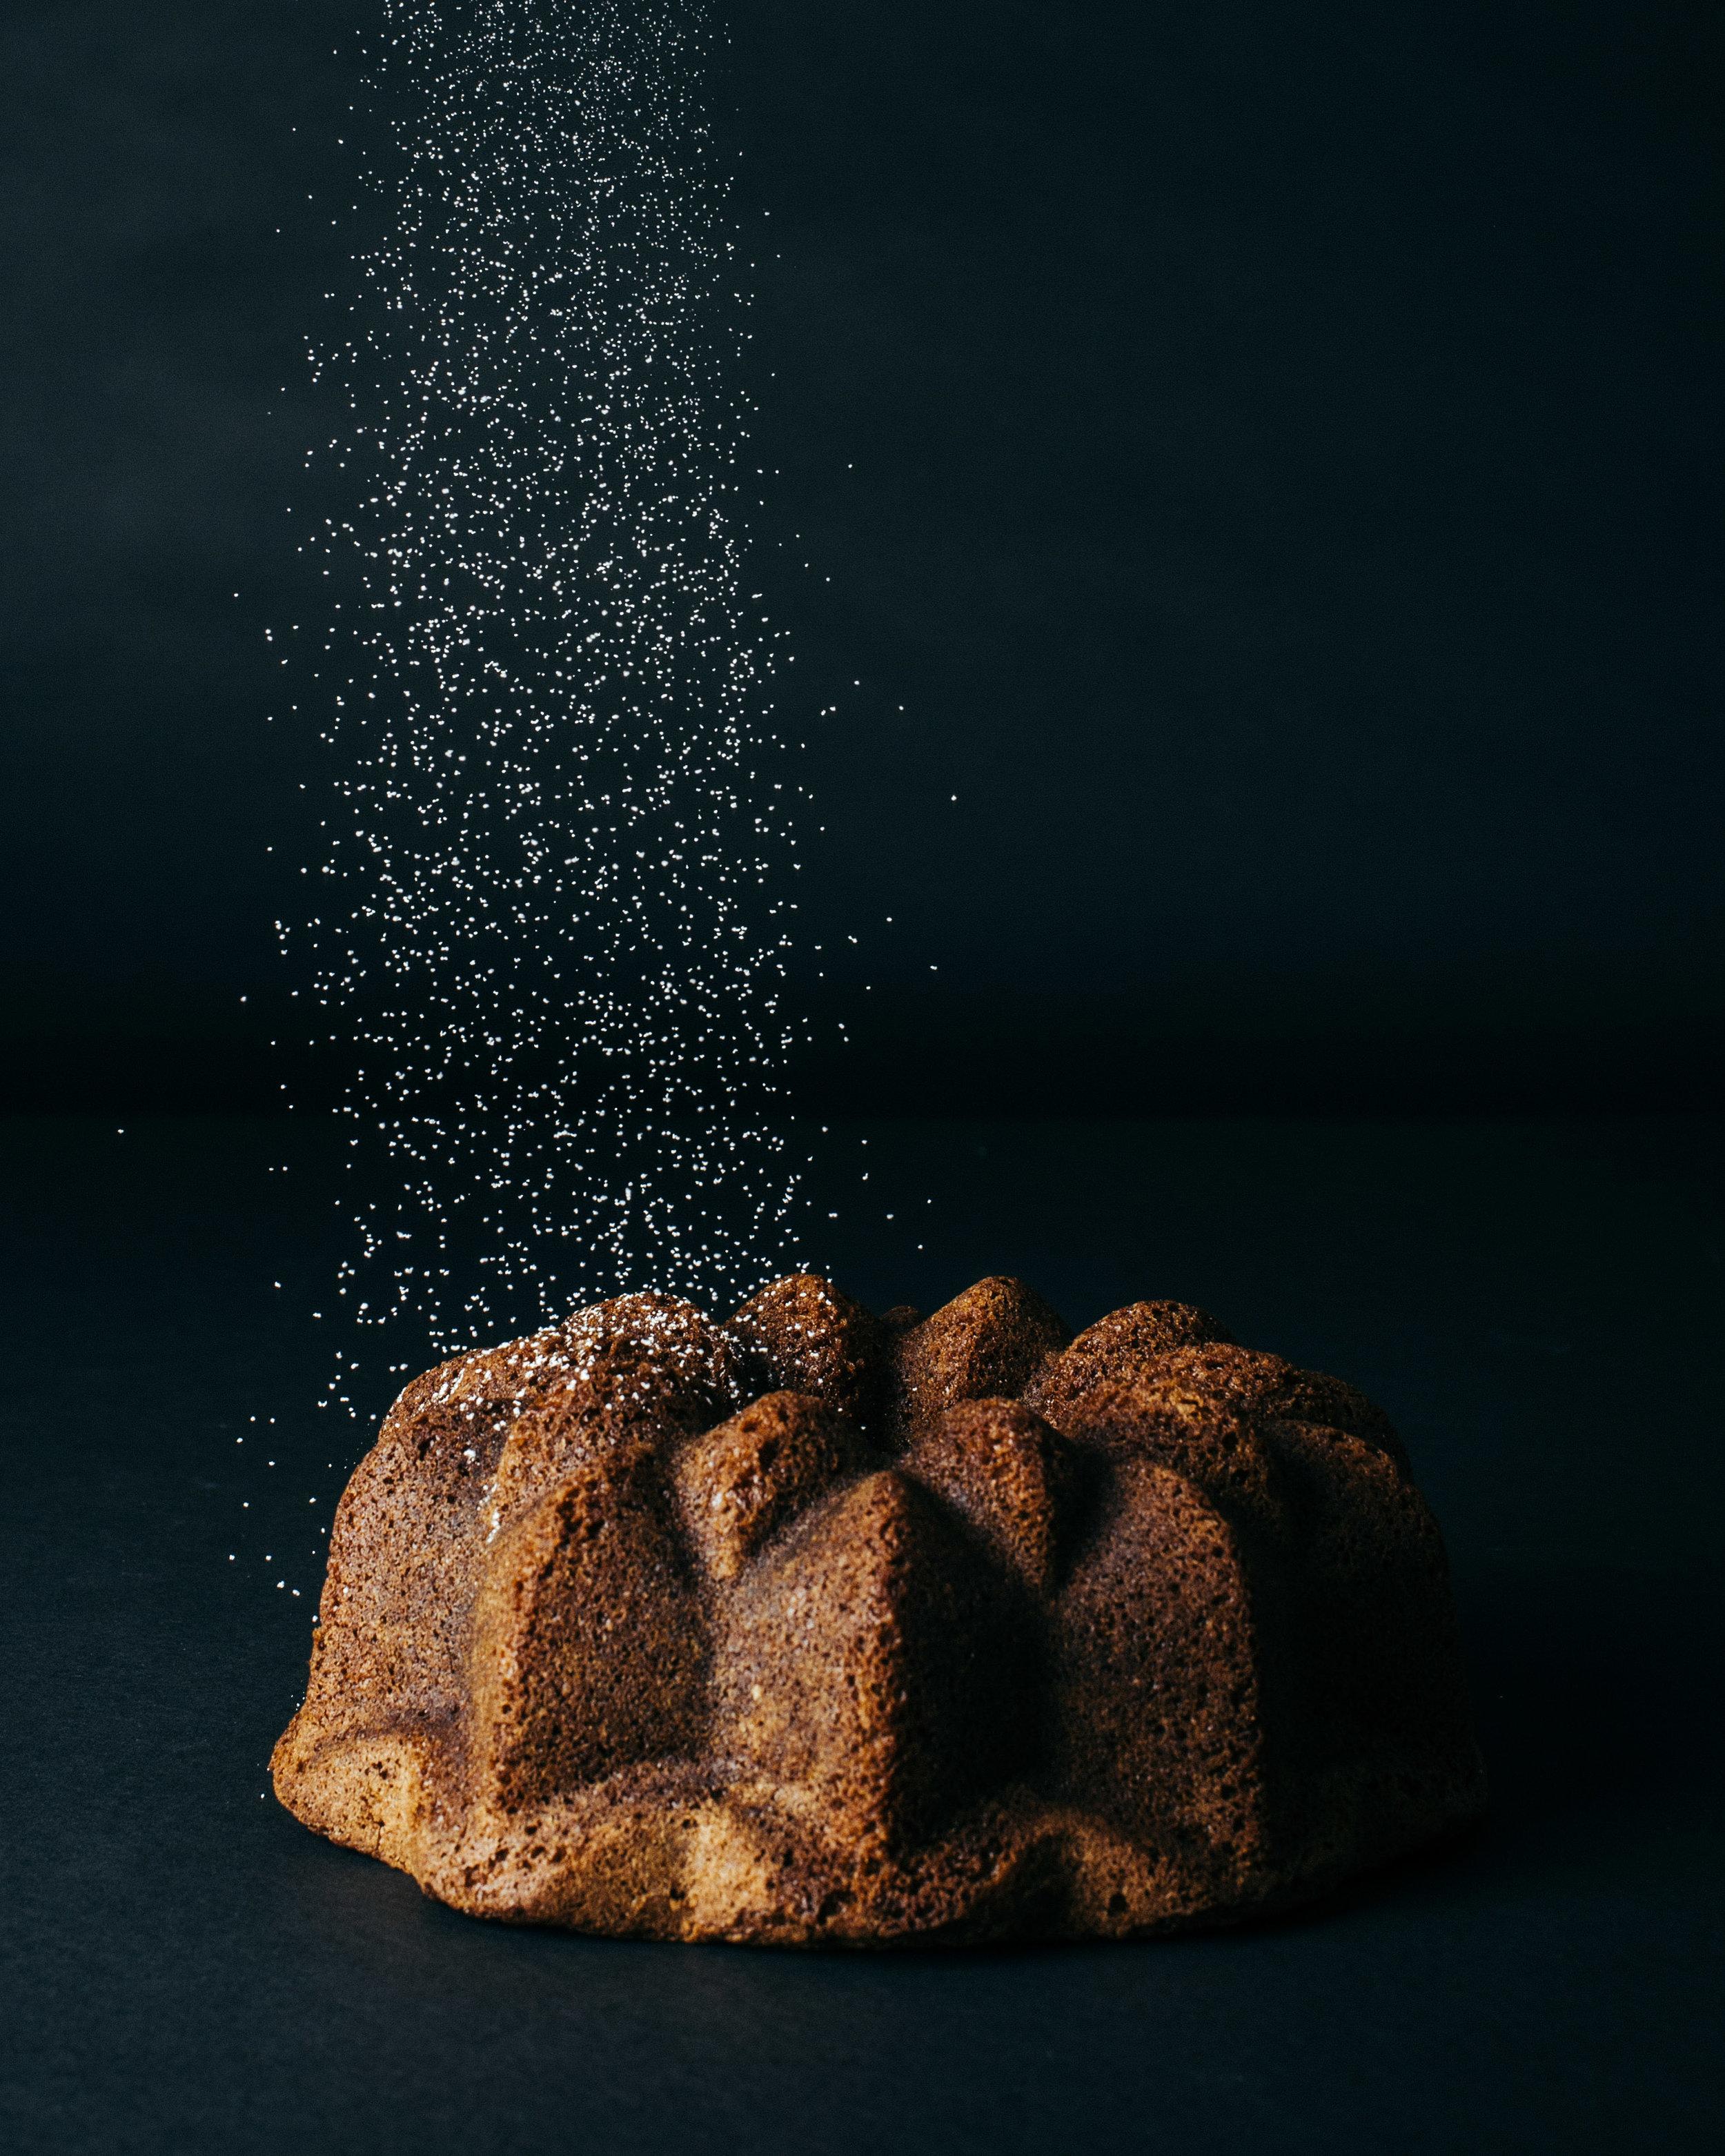 cake-002 copy.jpg